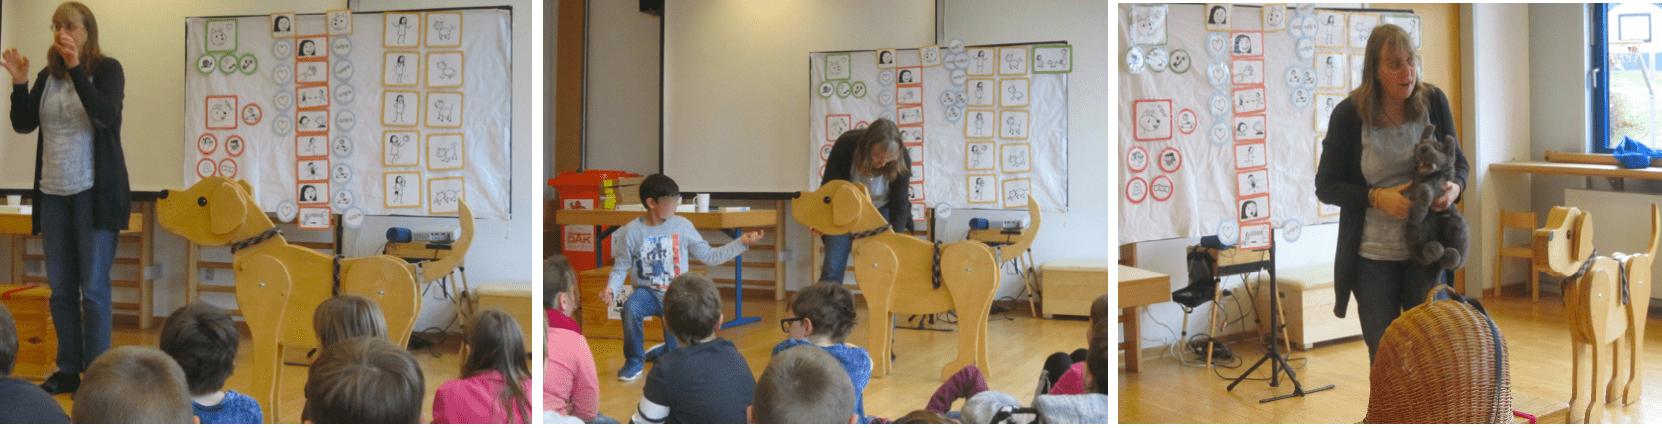 Hundegestützte Pädagogik im Unterricht